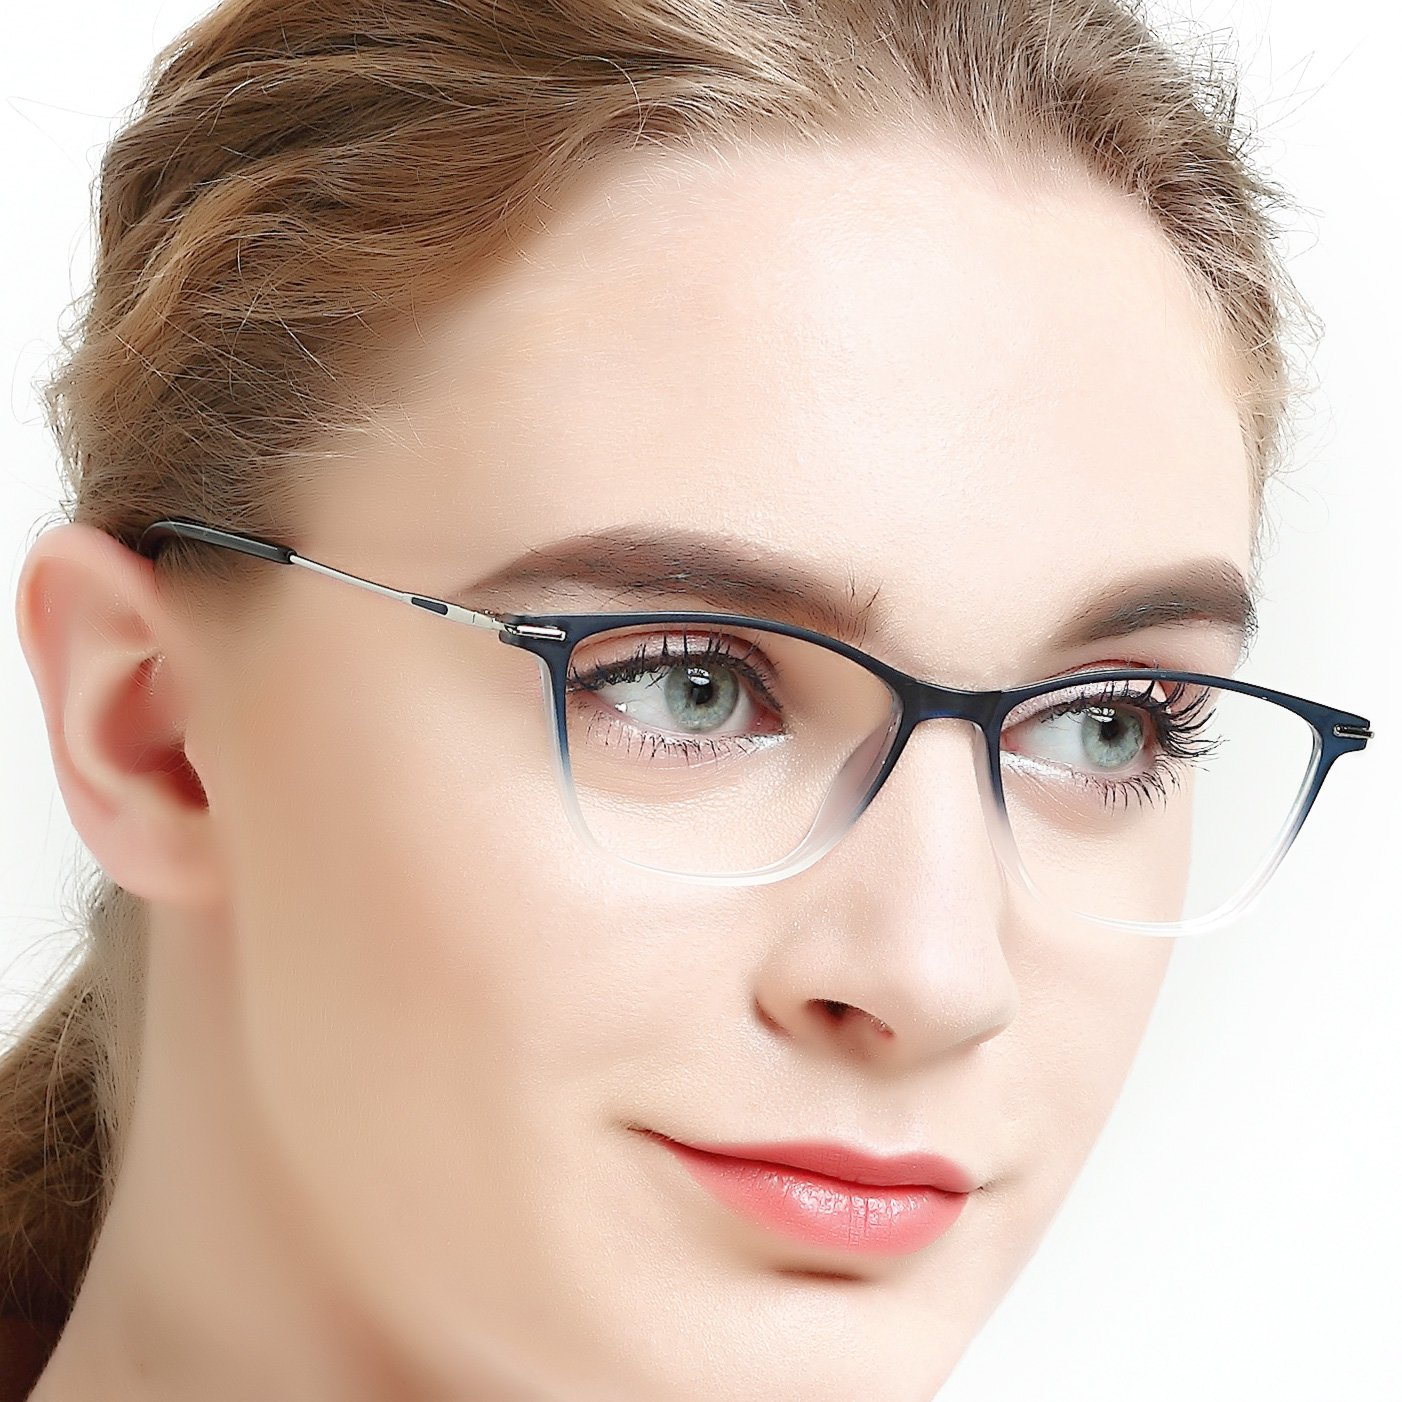 5a0b7395b1 Galleon - Eyewear Frames-OCCI CHIARI-Rectangle Lightweight Non-Prescription  Eyeglasses Frame With Clear Lenses For Womens 52mm